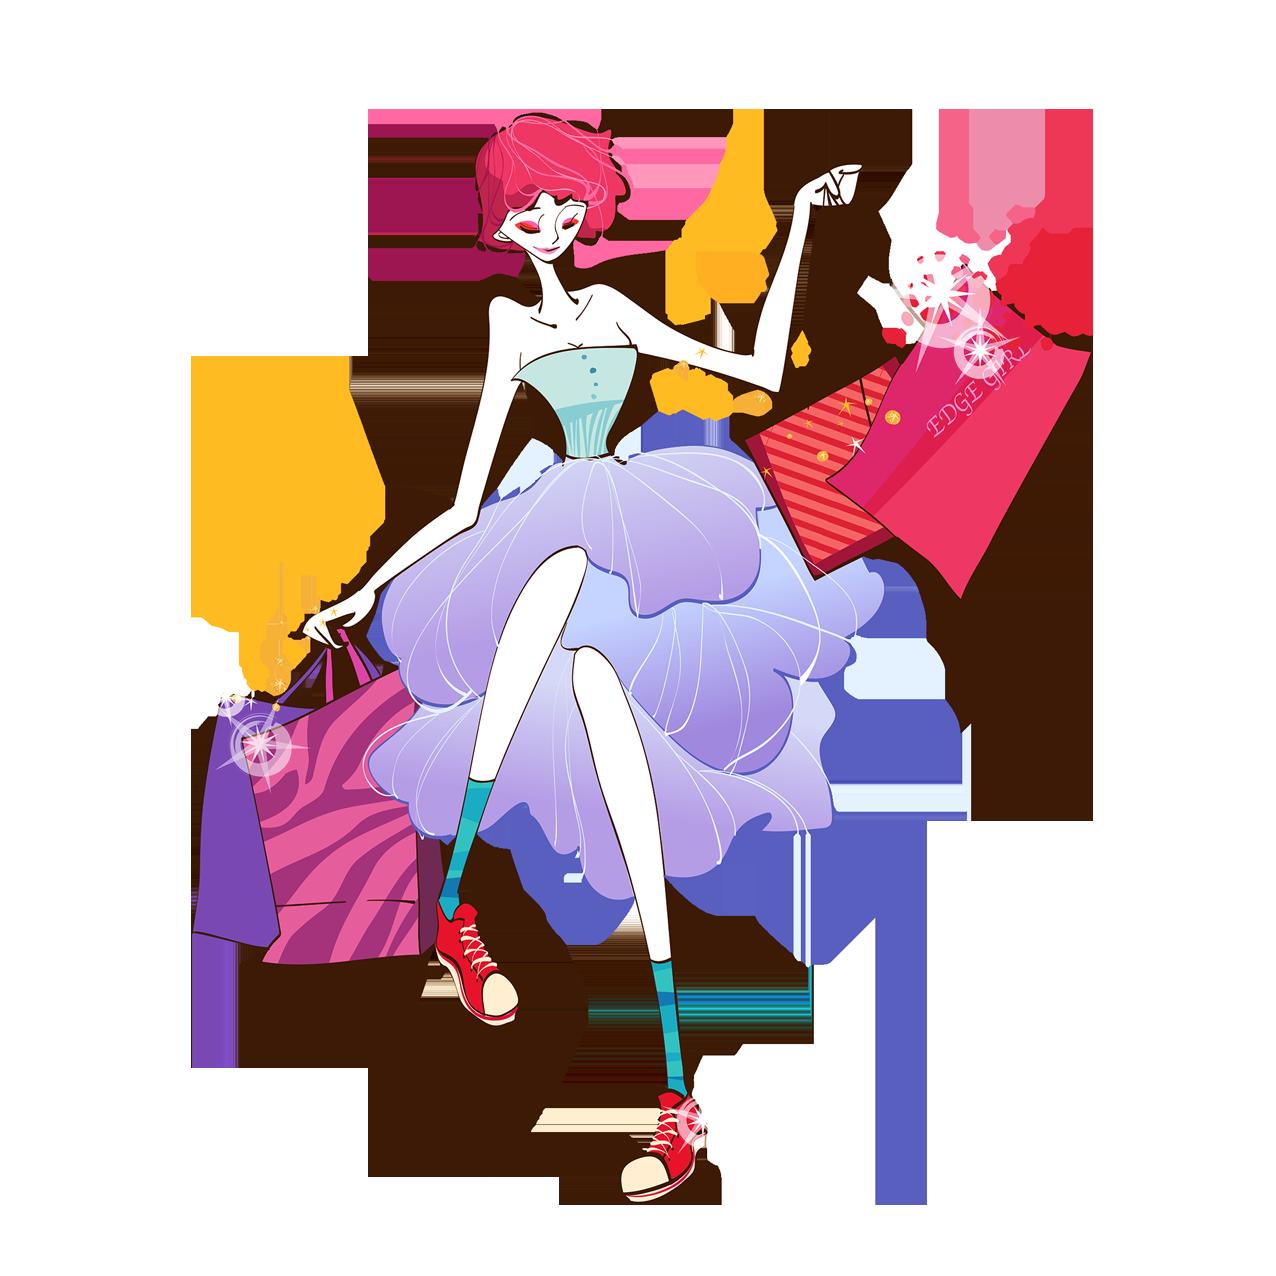 Woman shopping cartoon illustration. Fashion clipart pink fashion